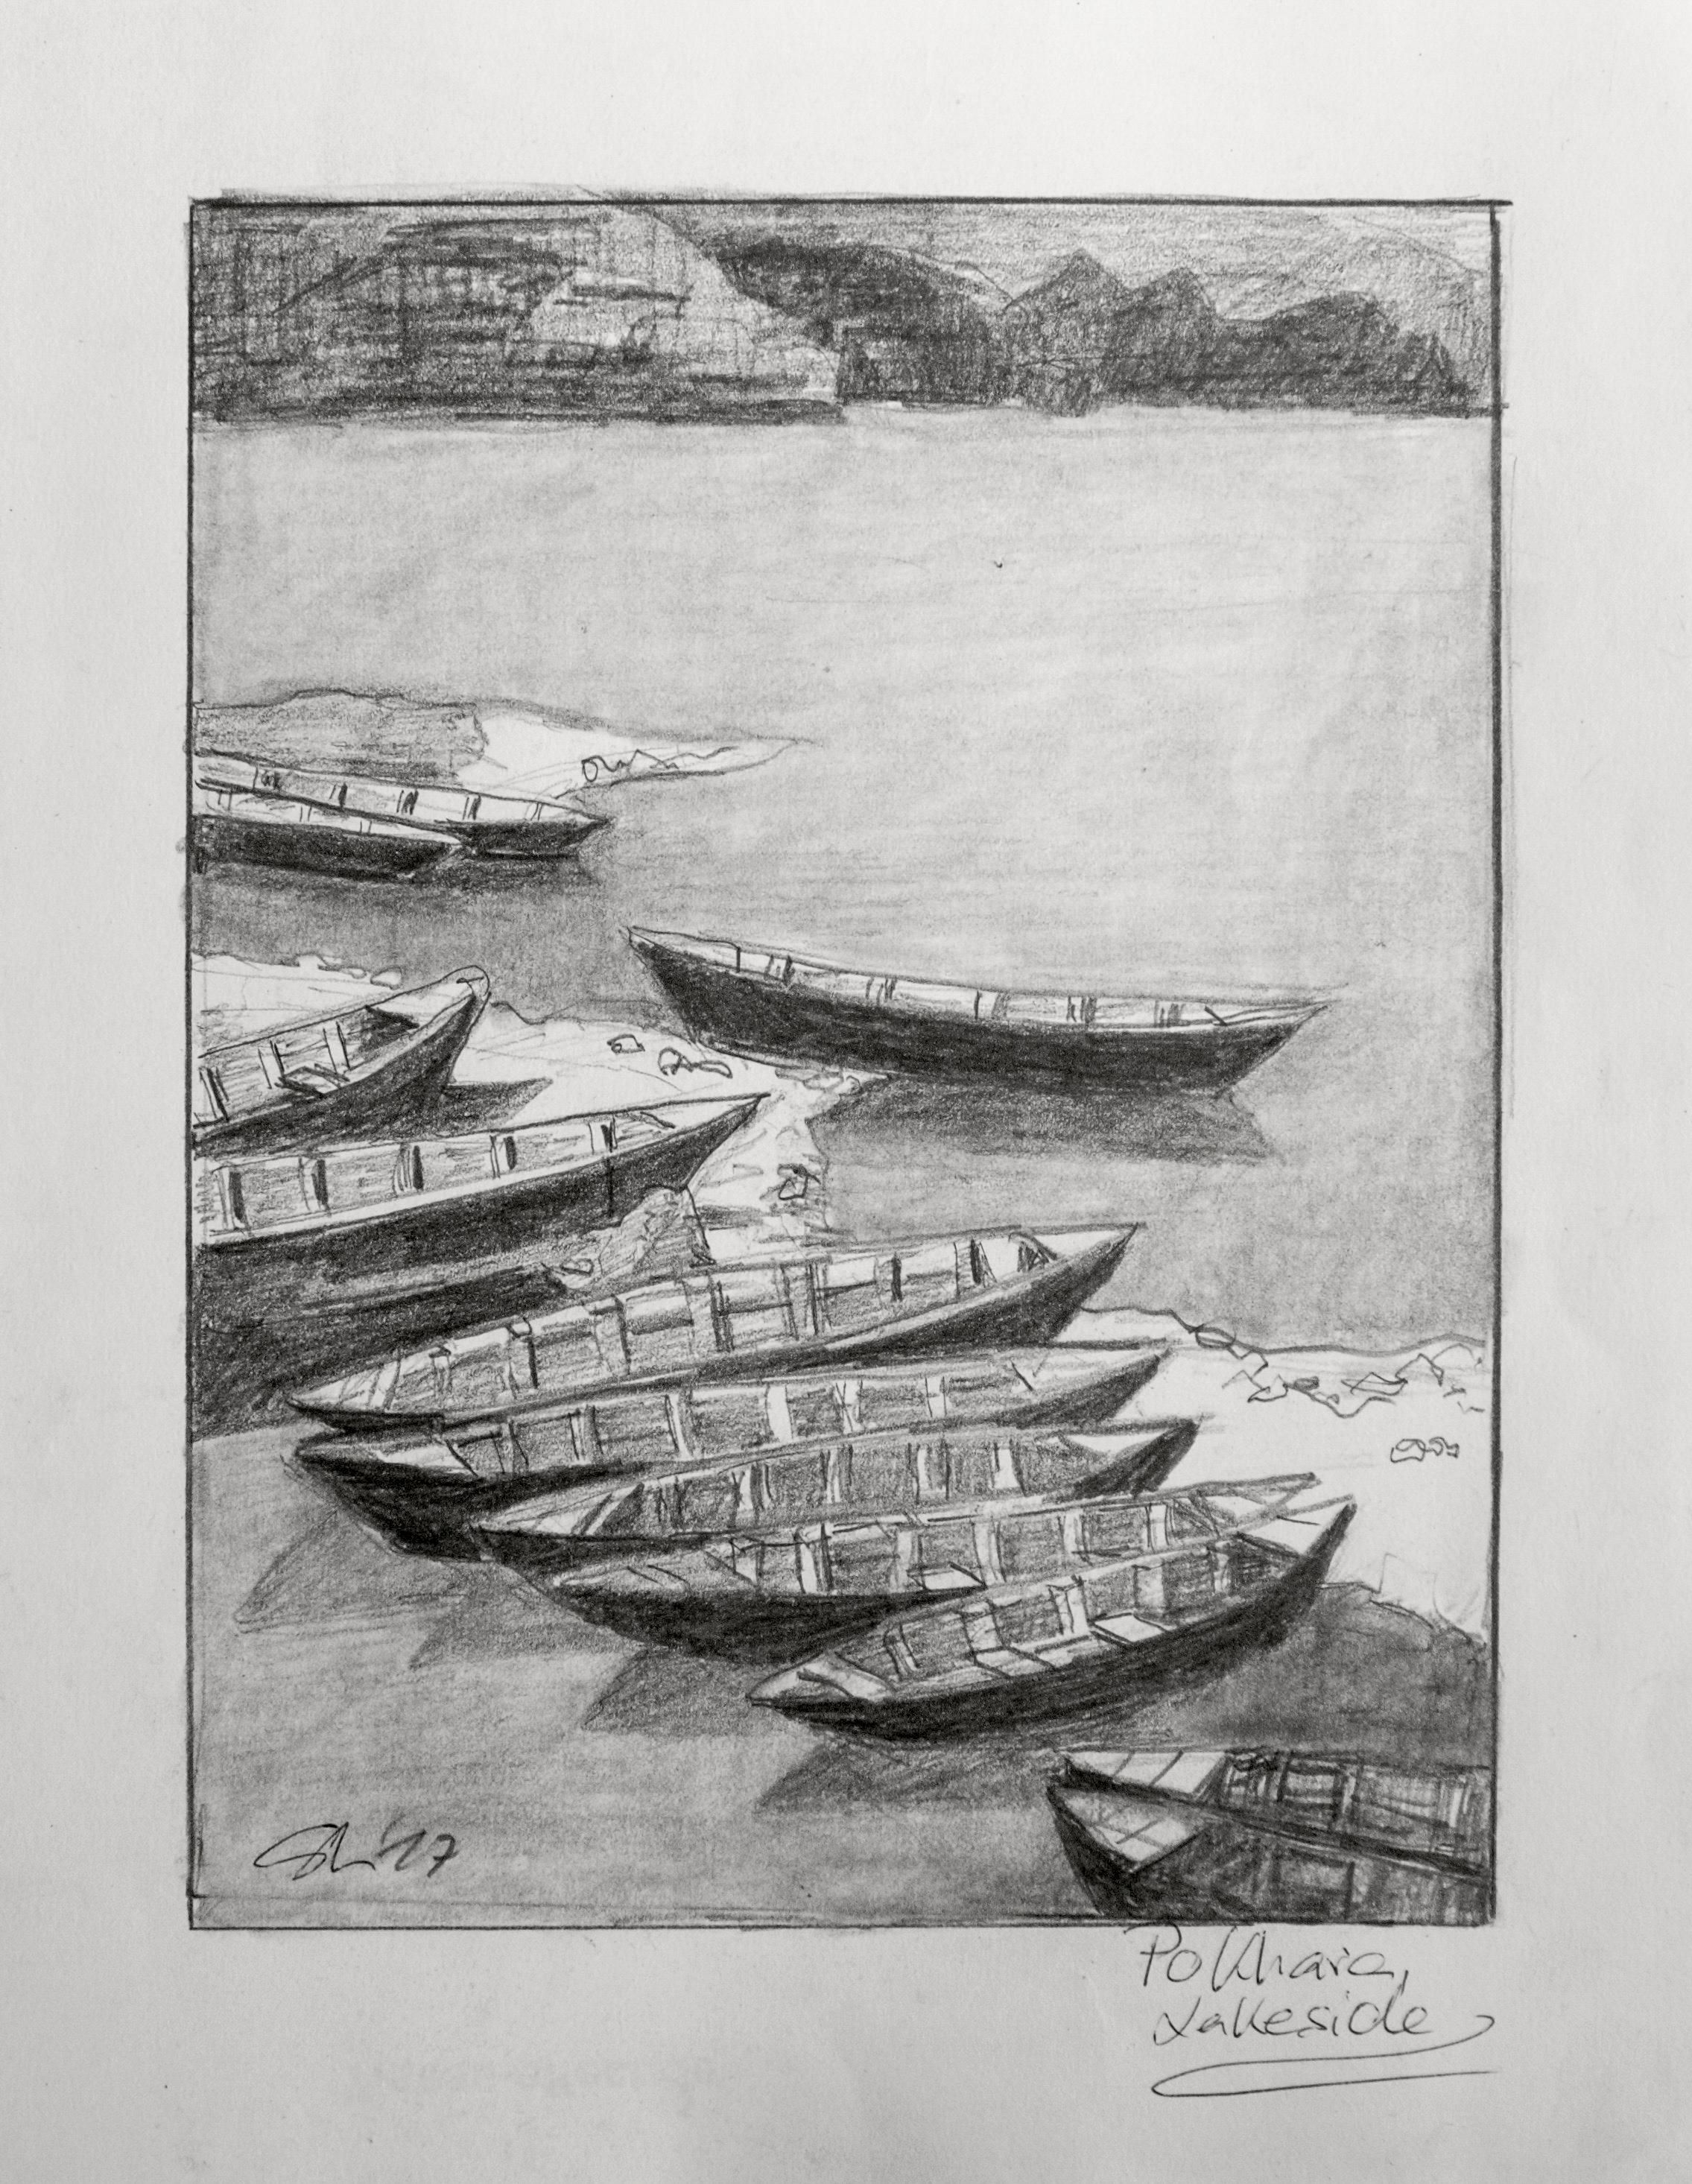 Boote Pokhara